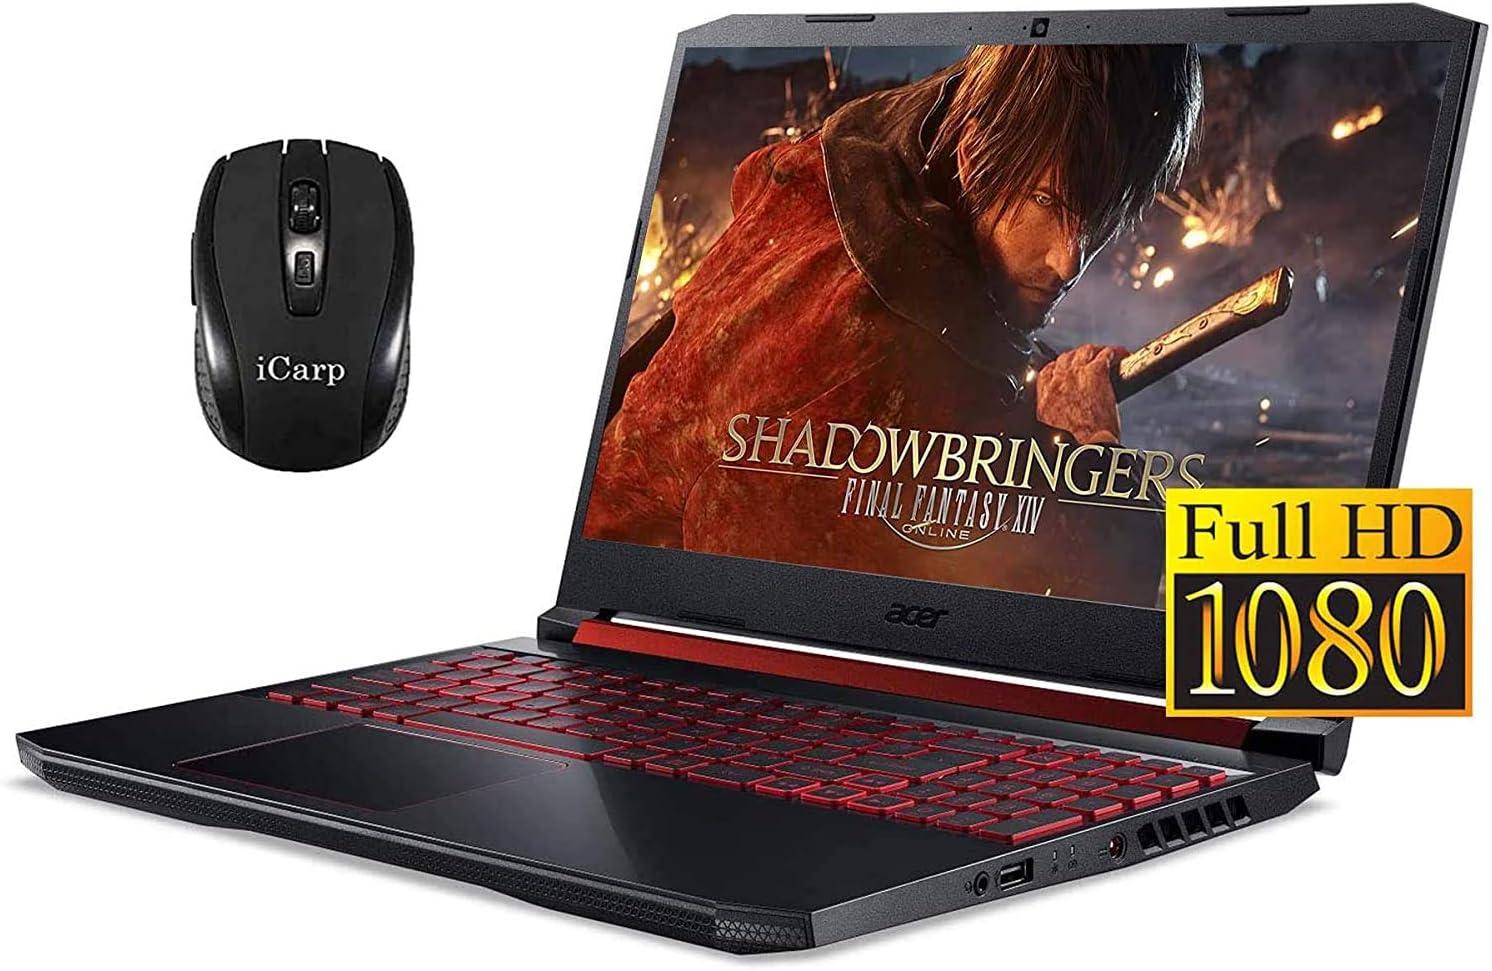 "2020 Premium Acer Nitro 5 15 Gaming Laptop 15.6"" Full HD IPS 9th Gen Intel 4-Core i5-9300H(Beats i7-7700HQ) 8GB DDR4 256GB PCIe SSD 1TB HDD 4GB GTX 1650 Backlit KB Win 10 + iCarp Wireless Mouse"